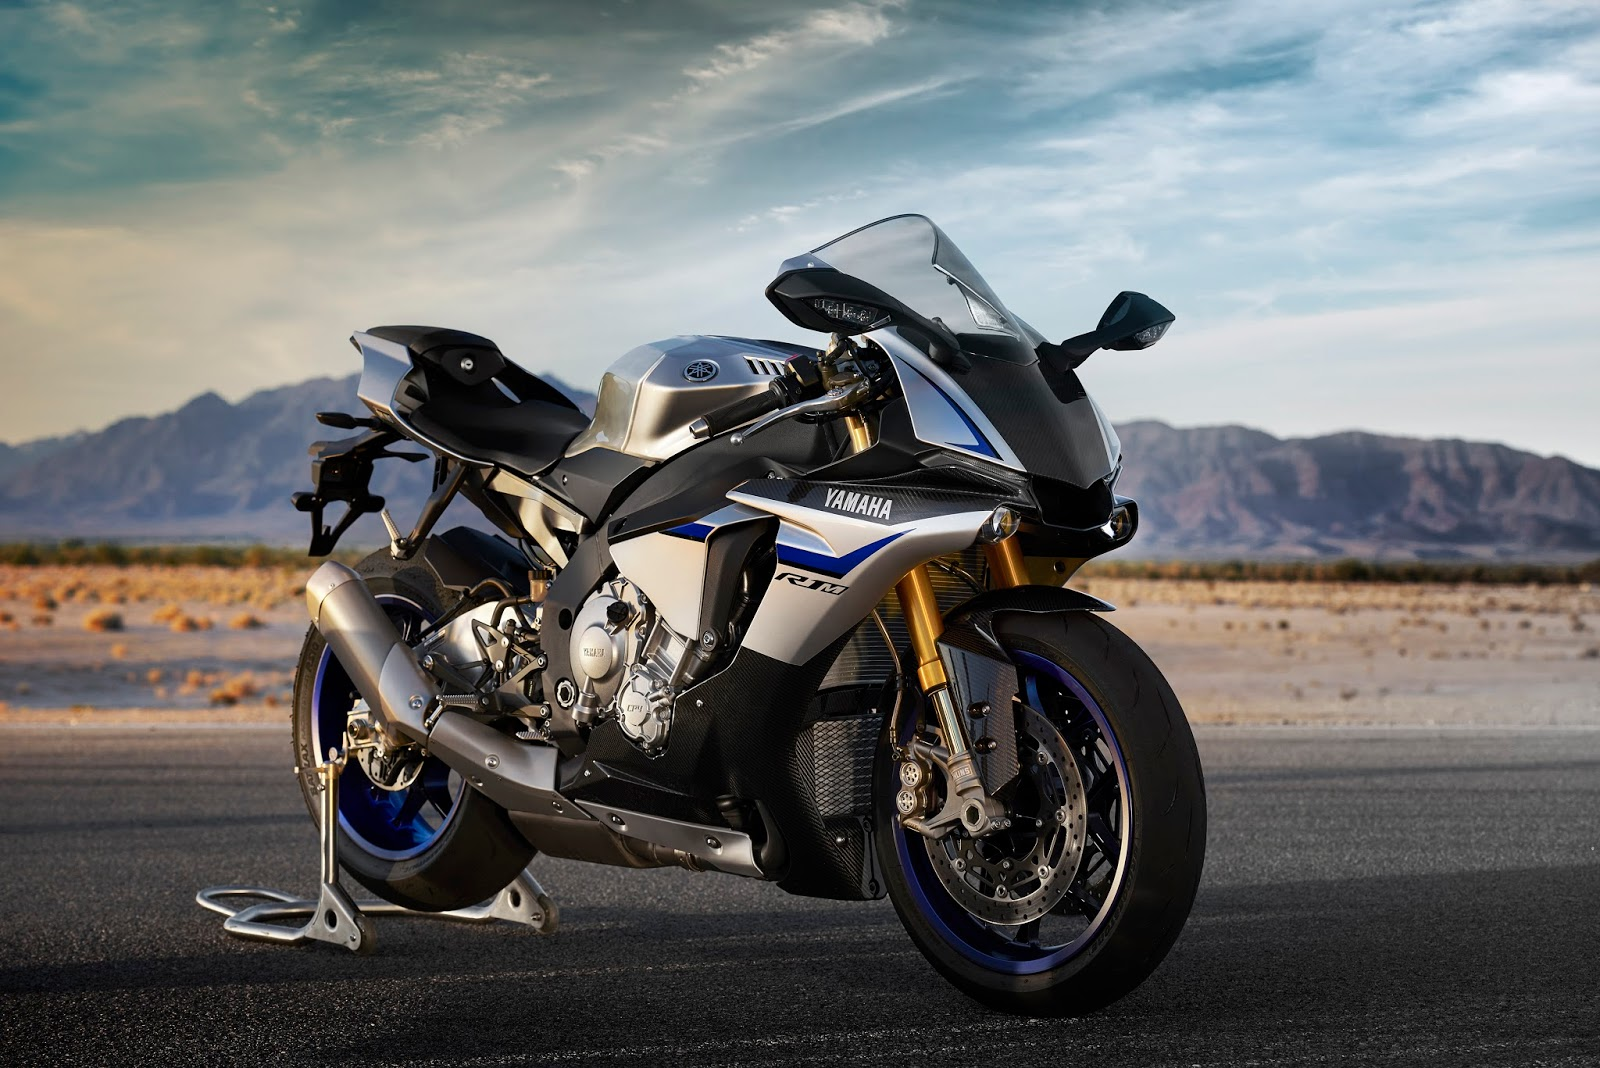 New 2016 Yamaha YZF R1 YZF R1M Hd Photos Gallery All Latest